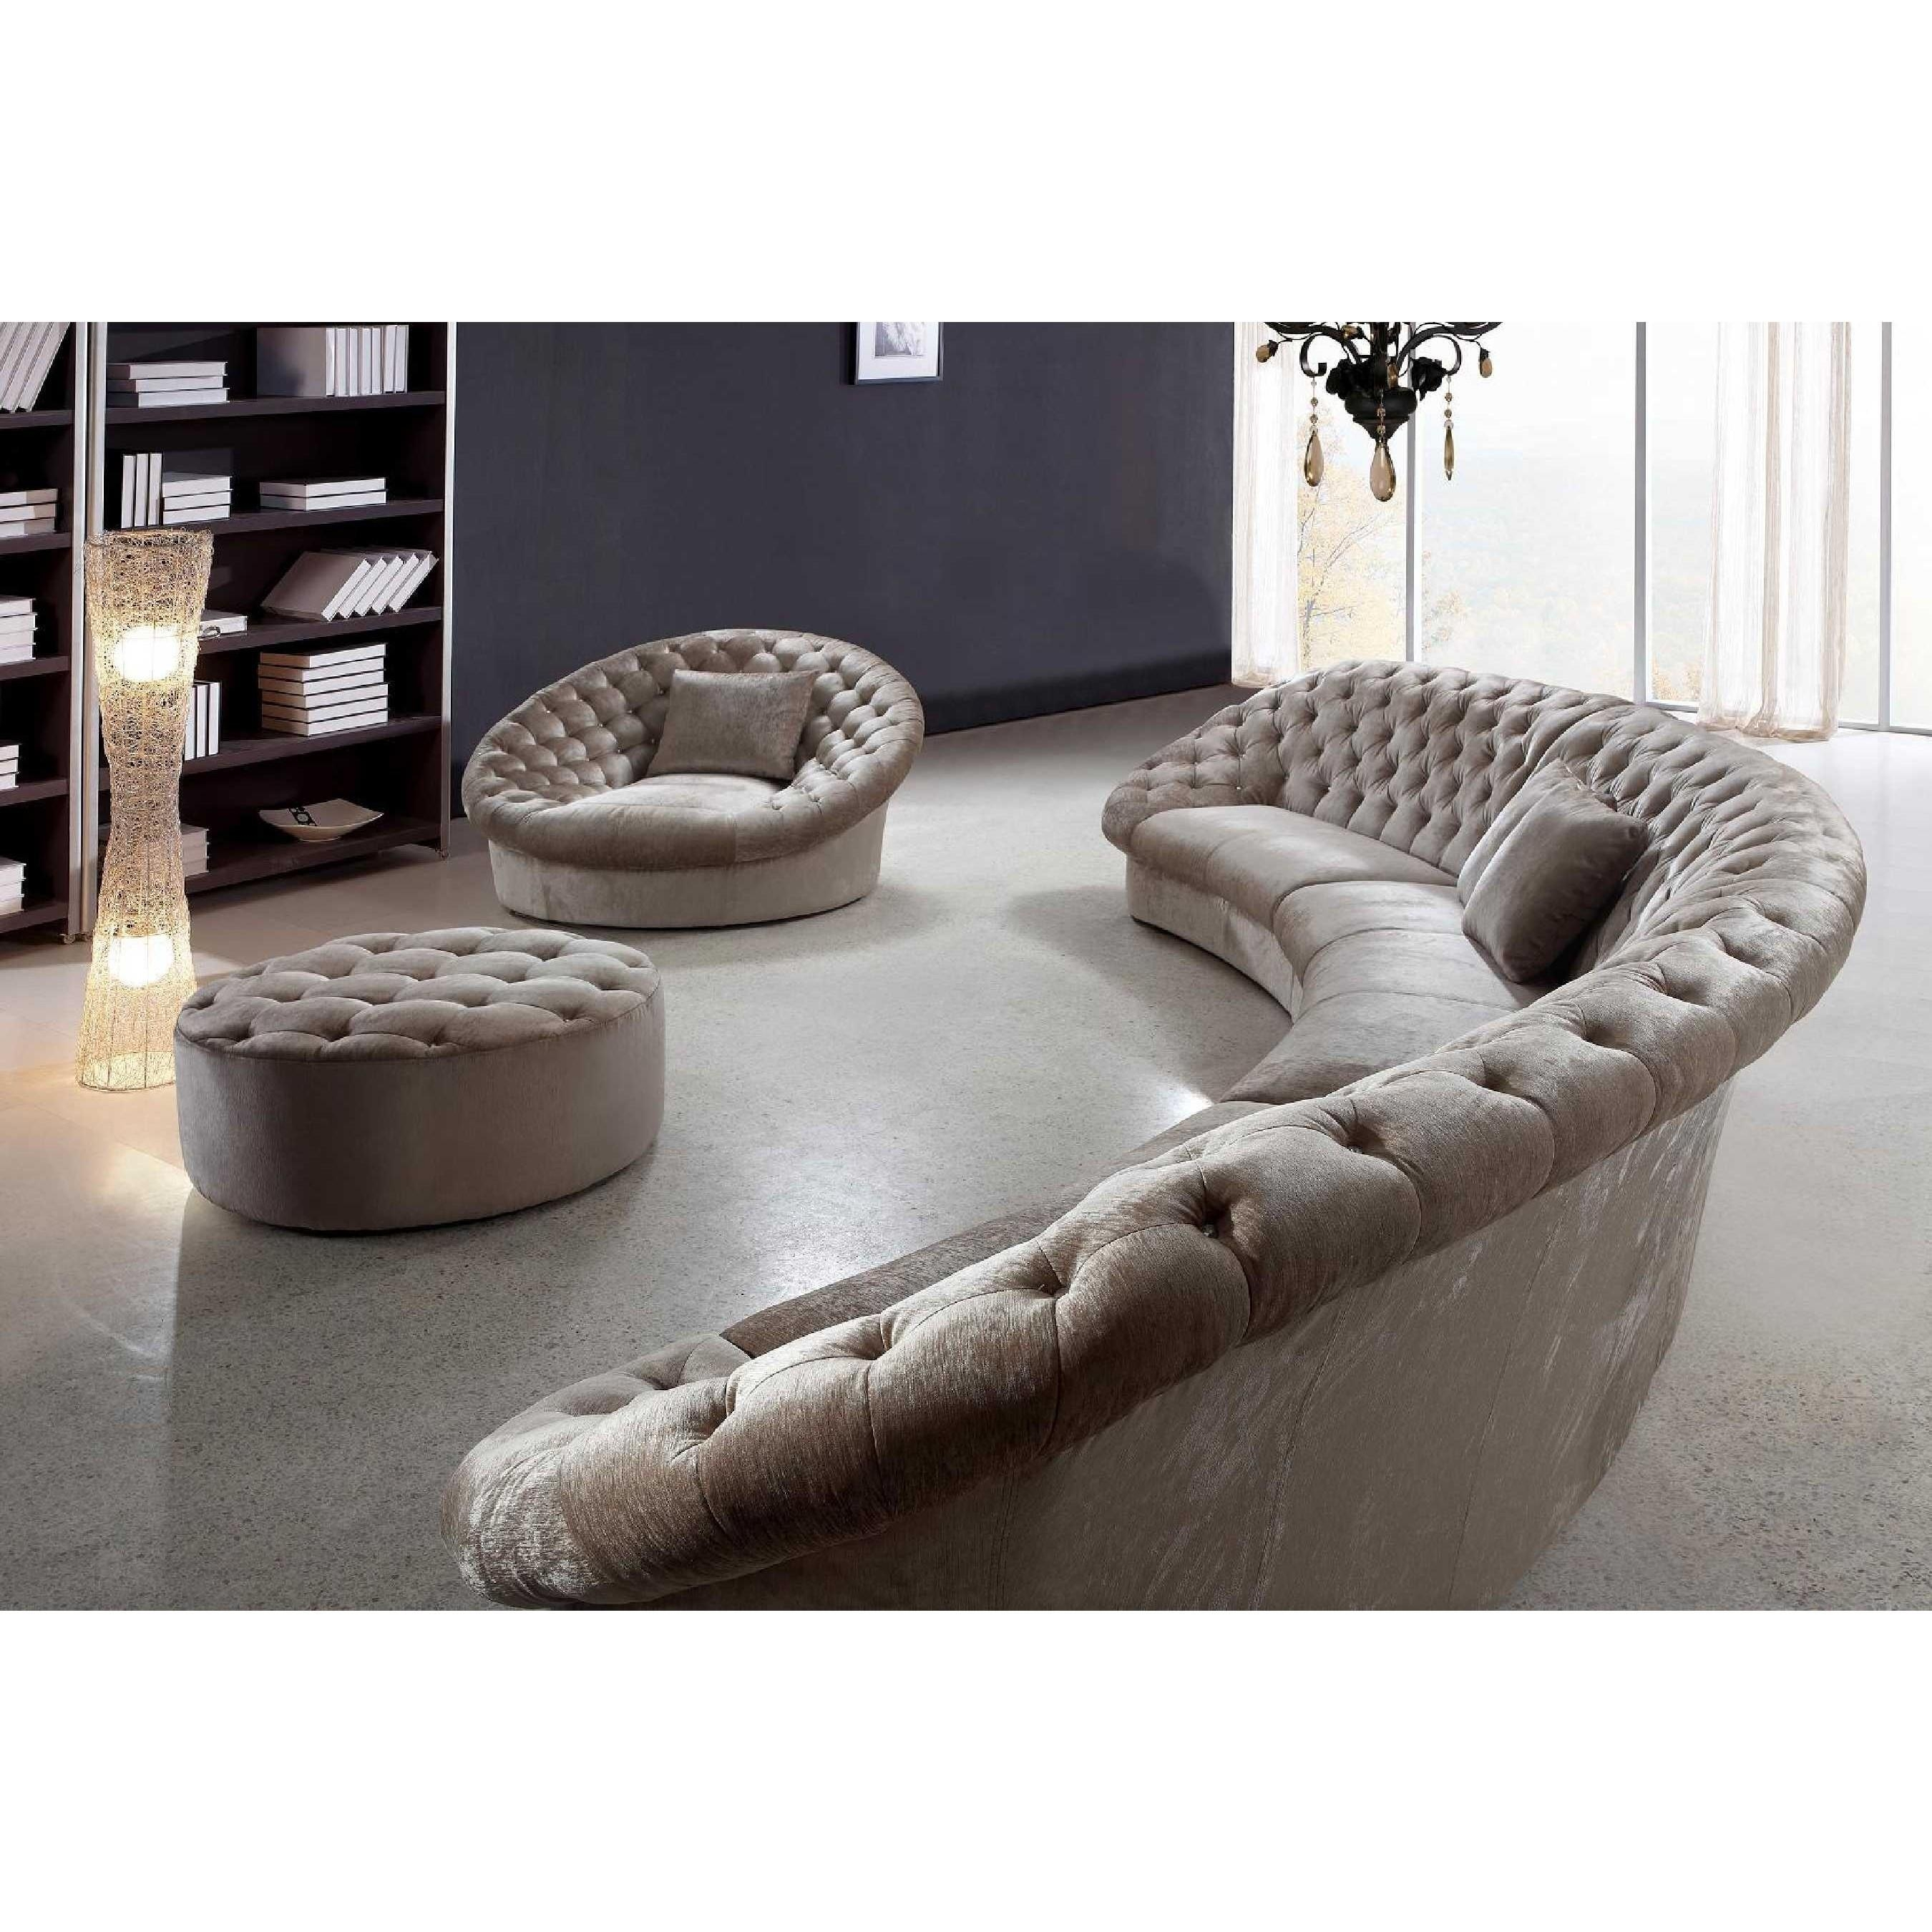 Sofa Oval – Bürostuhl With Regard To Oval Sofas (View 4 of 21)